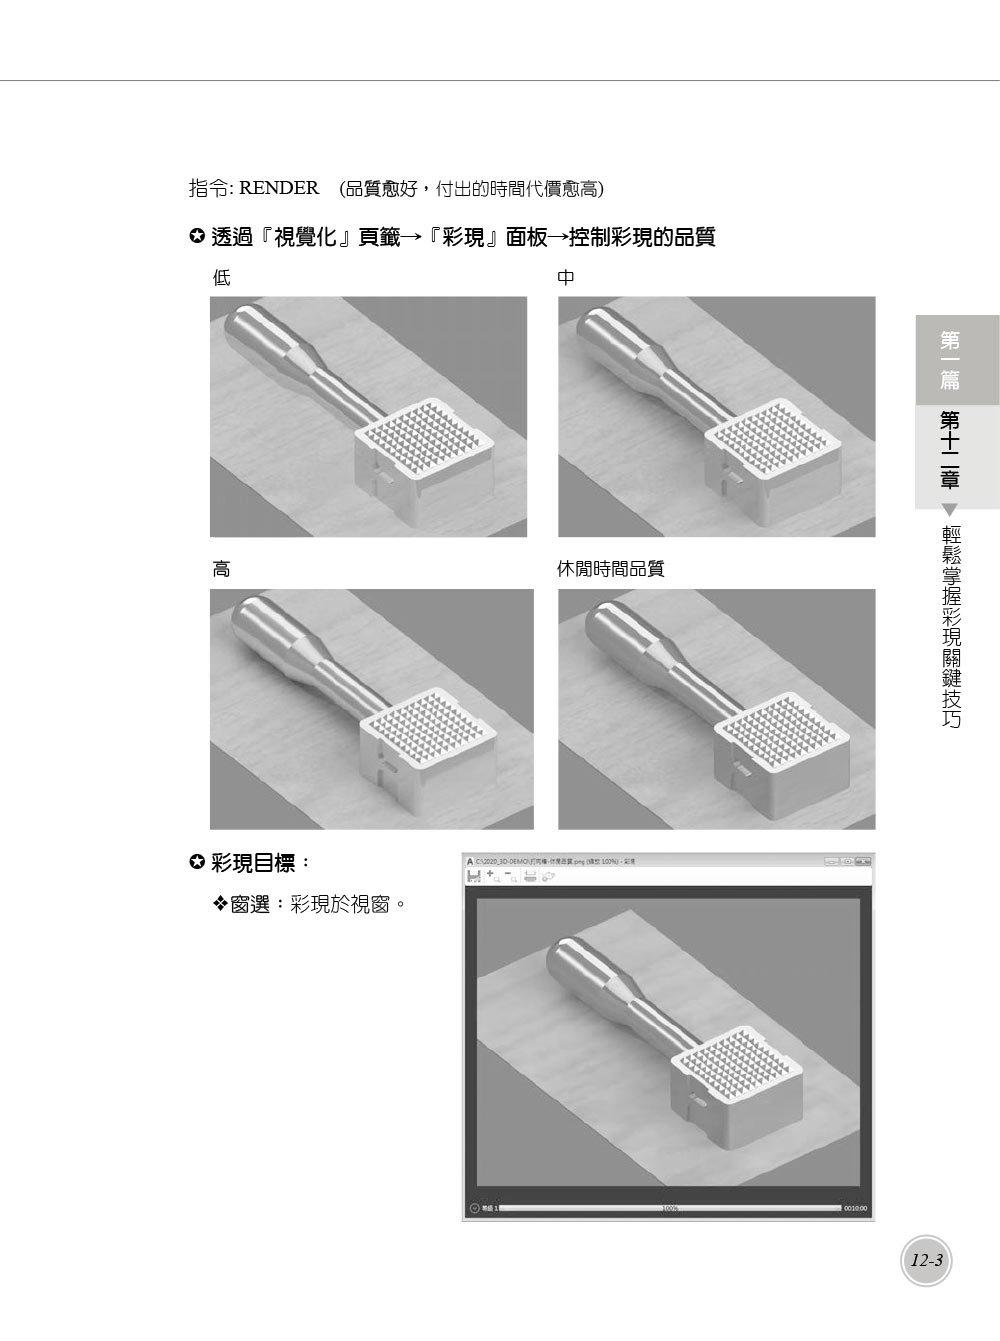 TQC+ AutoCAD 2020 特訓教材 -- 3D應用篇 (隨書附贈23個精彩3D動態教學檔)-preview-3